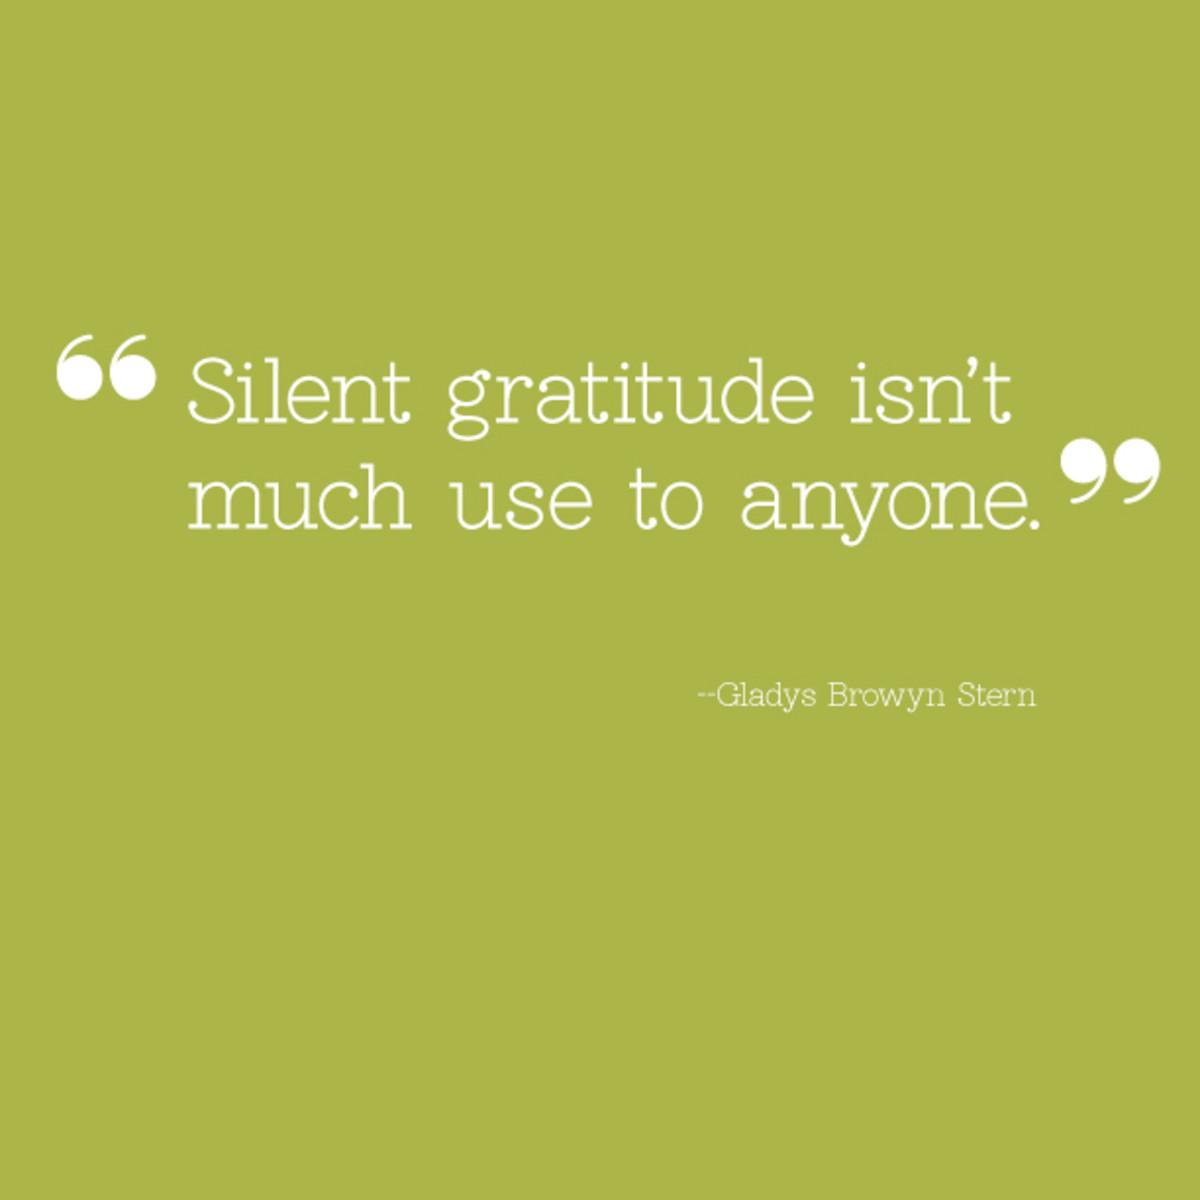 quotes for gratitude